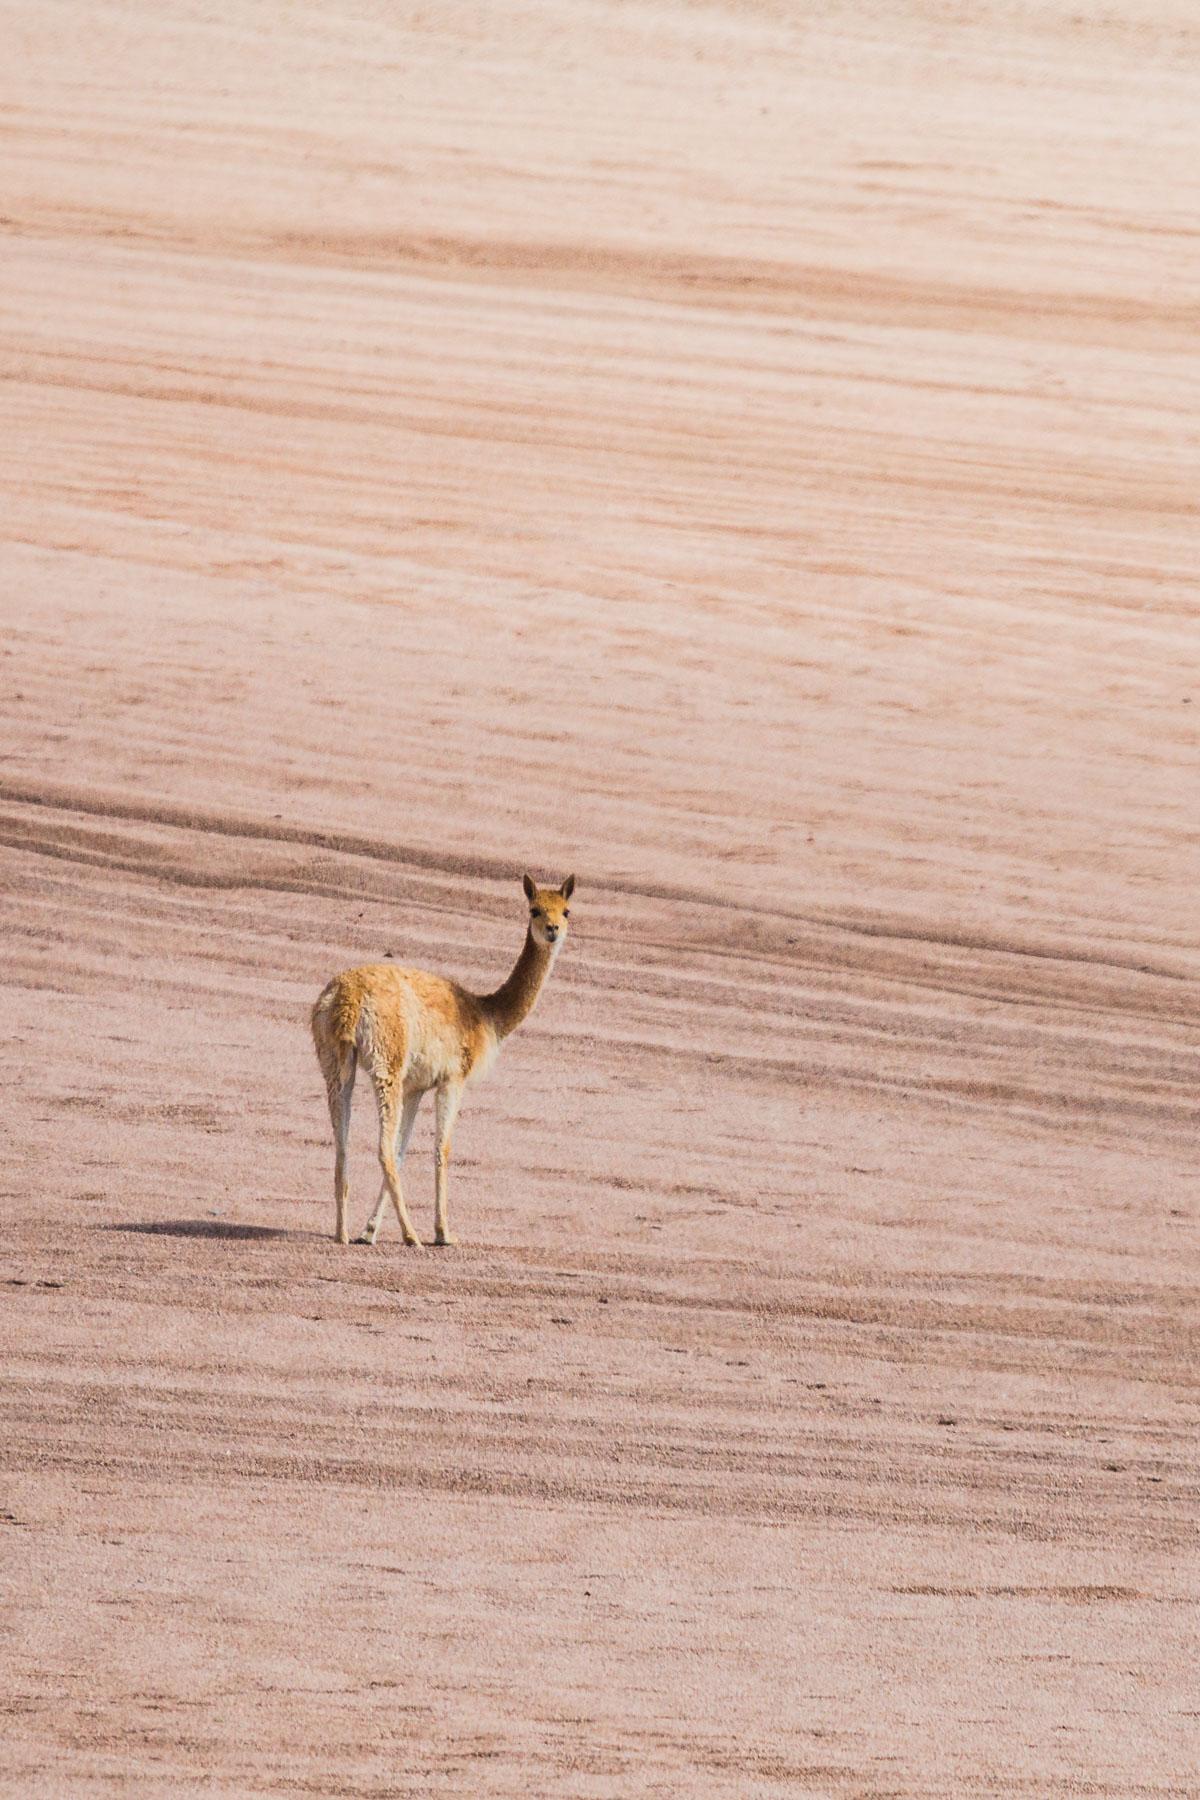 vicuna-portrait-wildlife-photography-travel-bolivia-bolivian-fauna-animals-eduardo-avaroa-national-park-travel.jpg